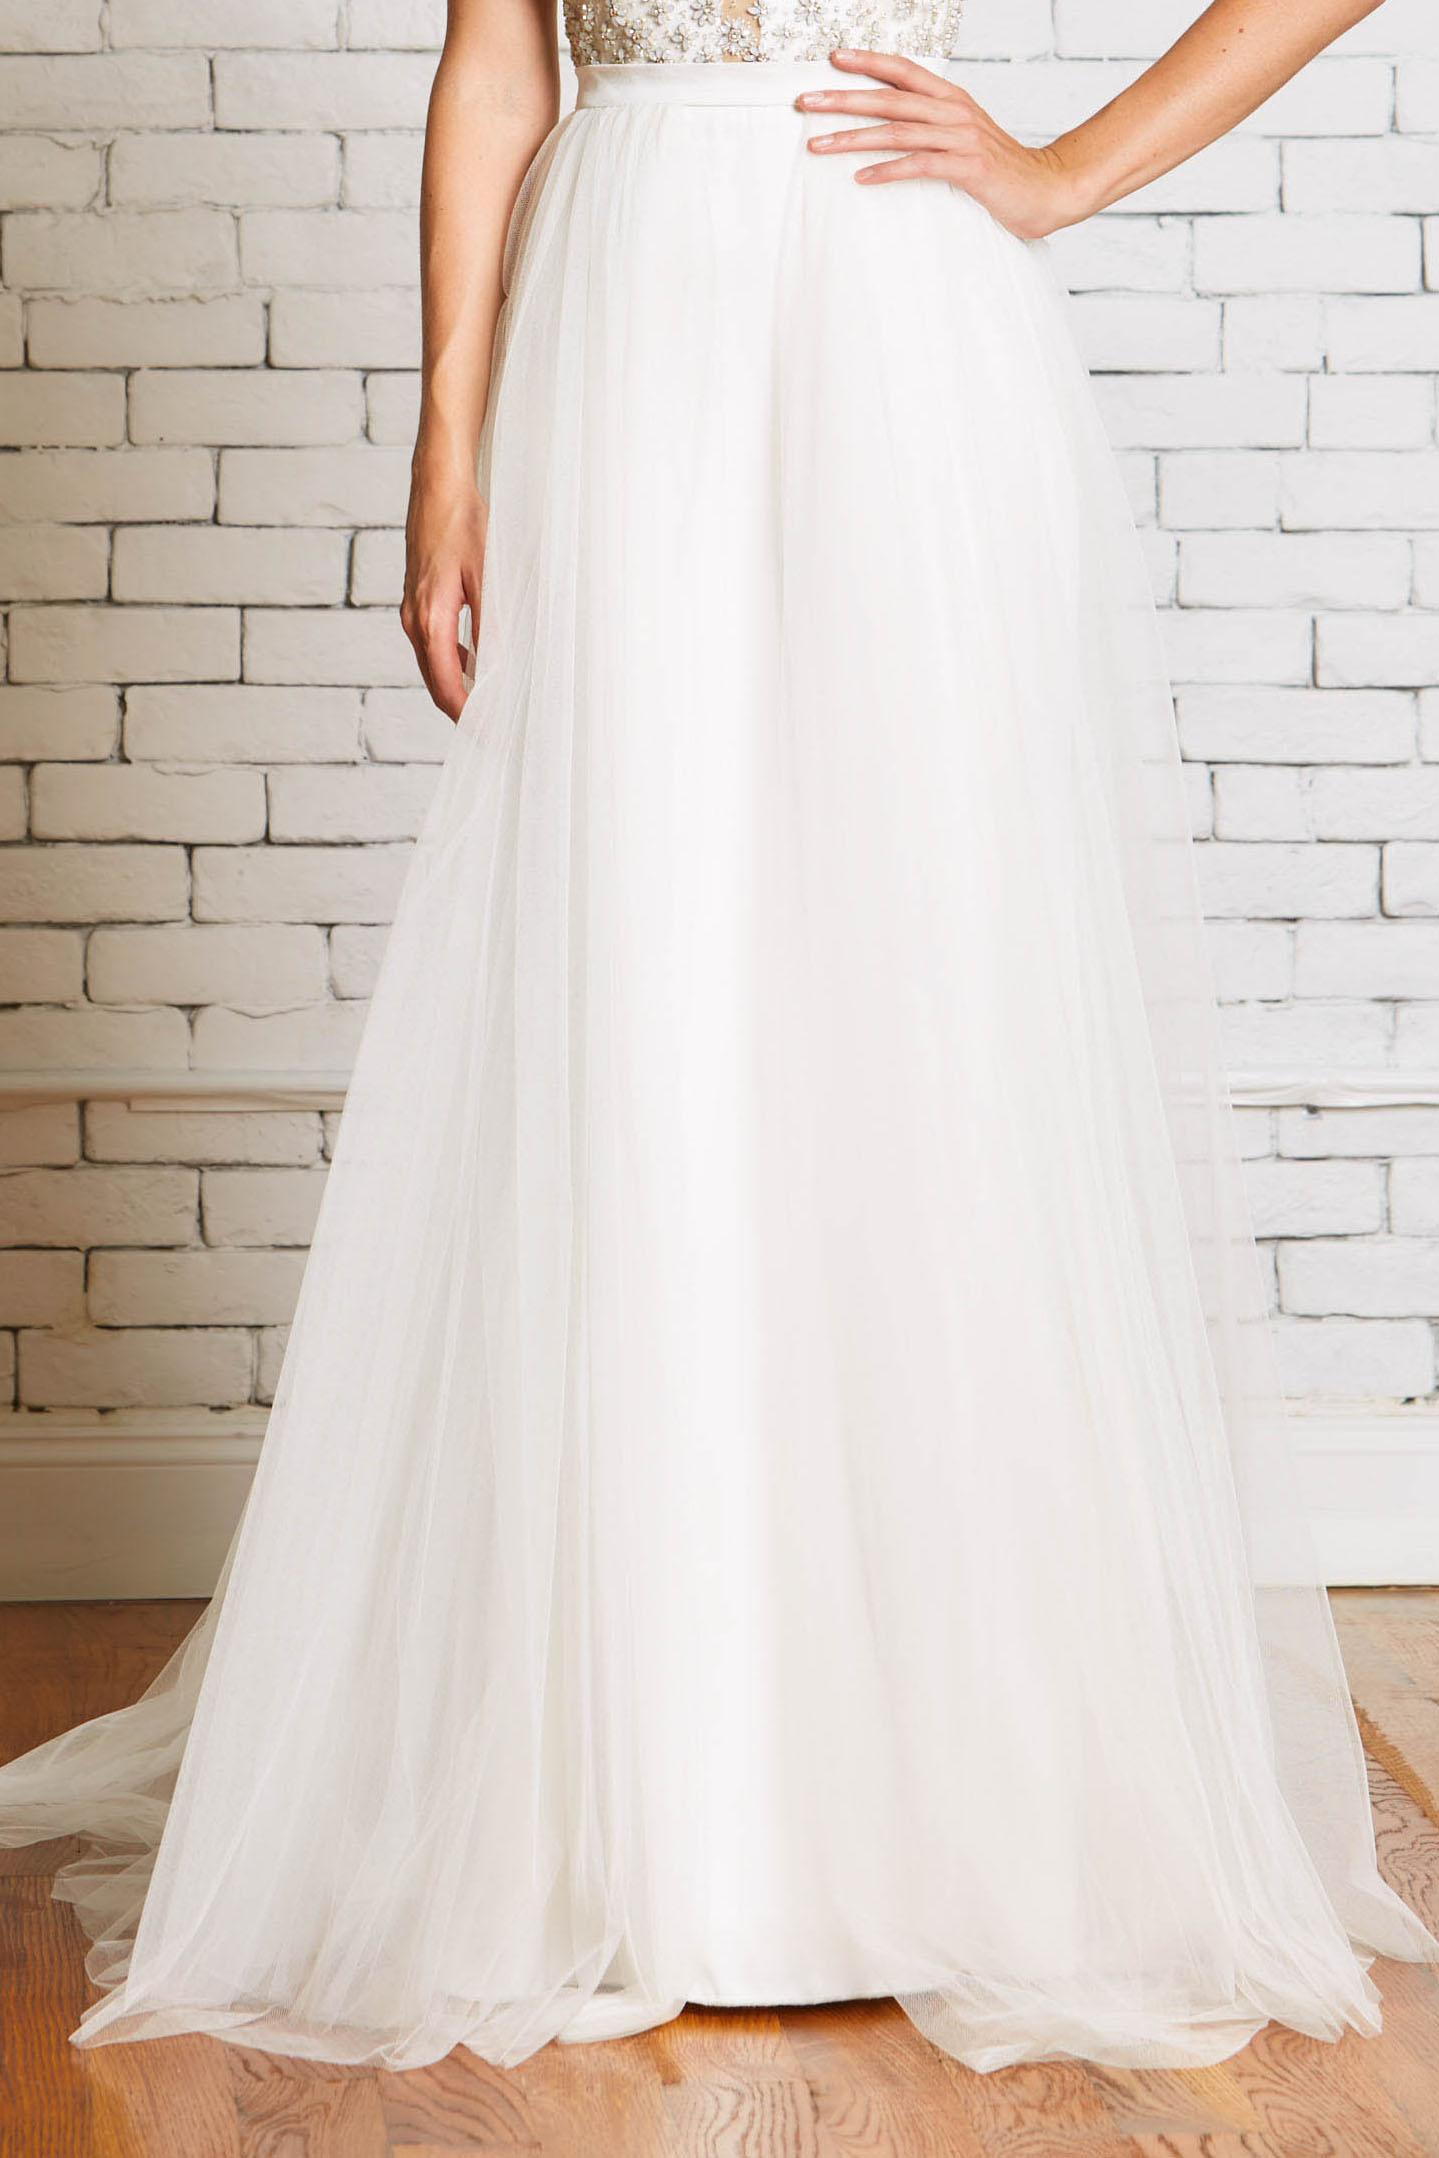 Rebecca_Schoneveld_Millie-Overskirt_front-Wedding_Tulle_Unique_Separates.jpg